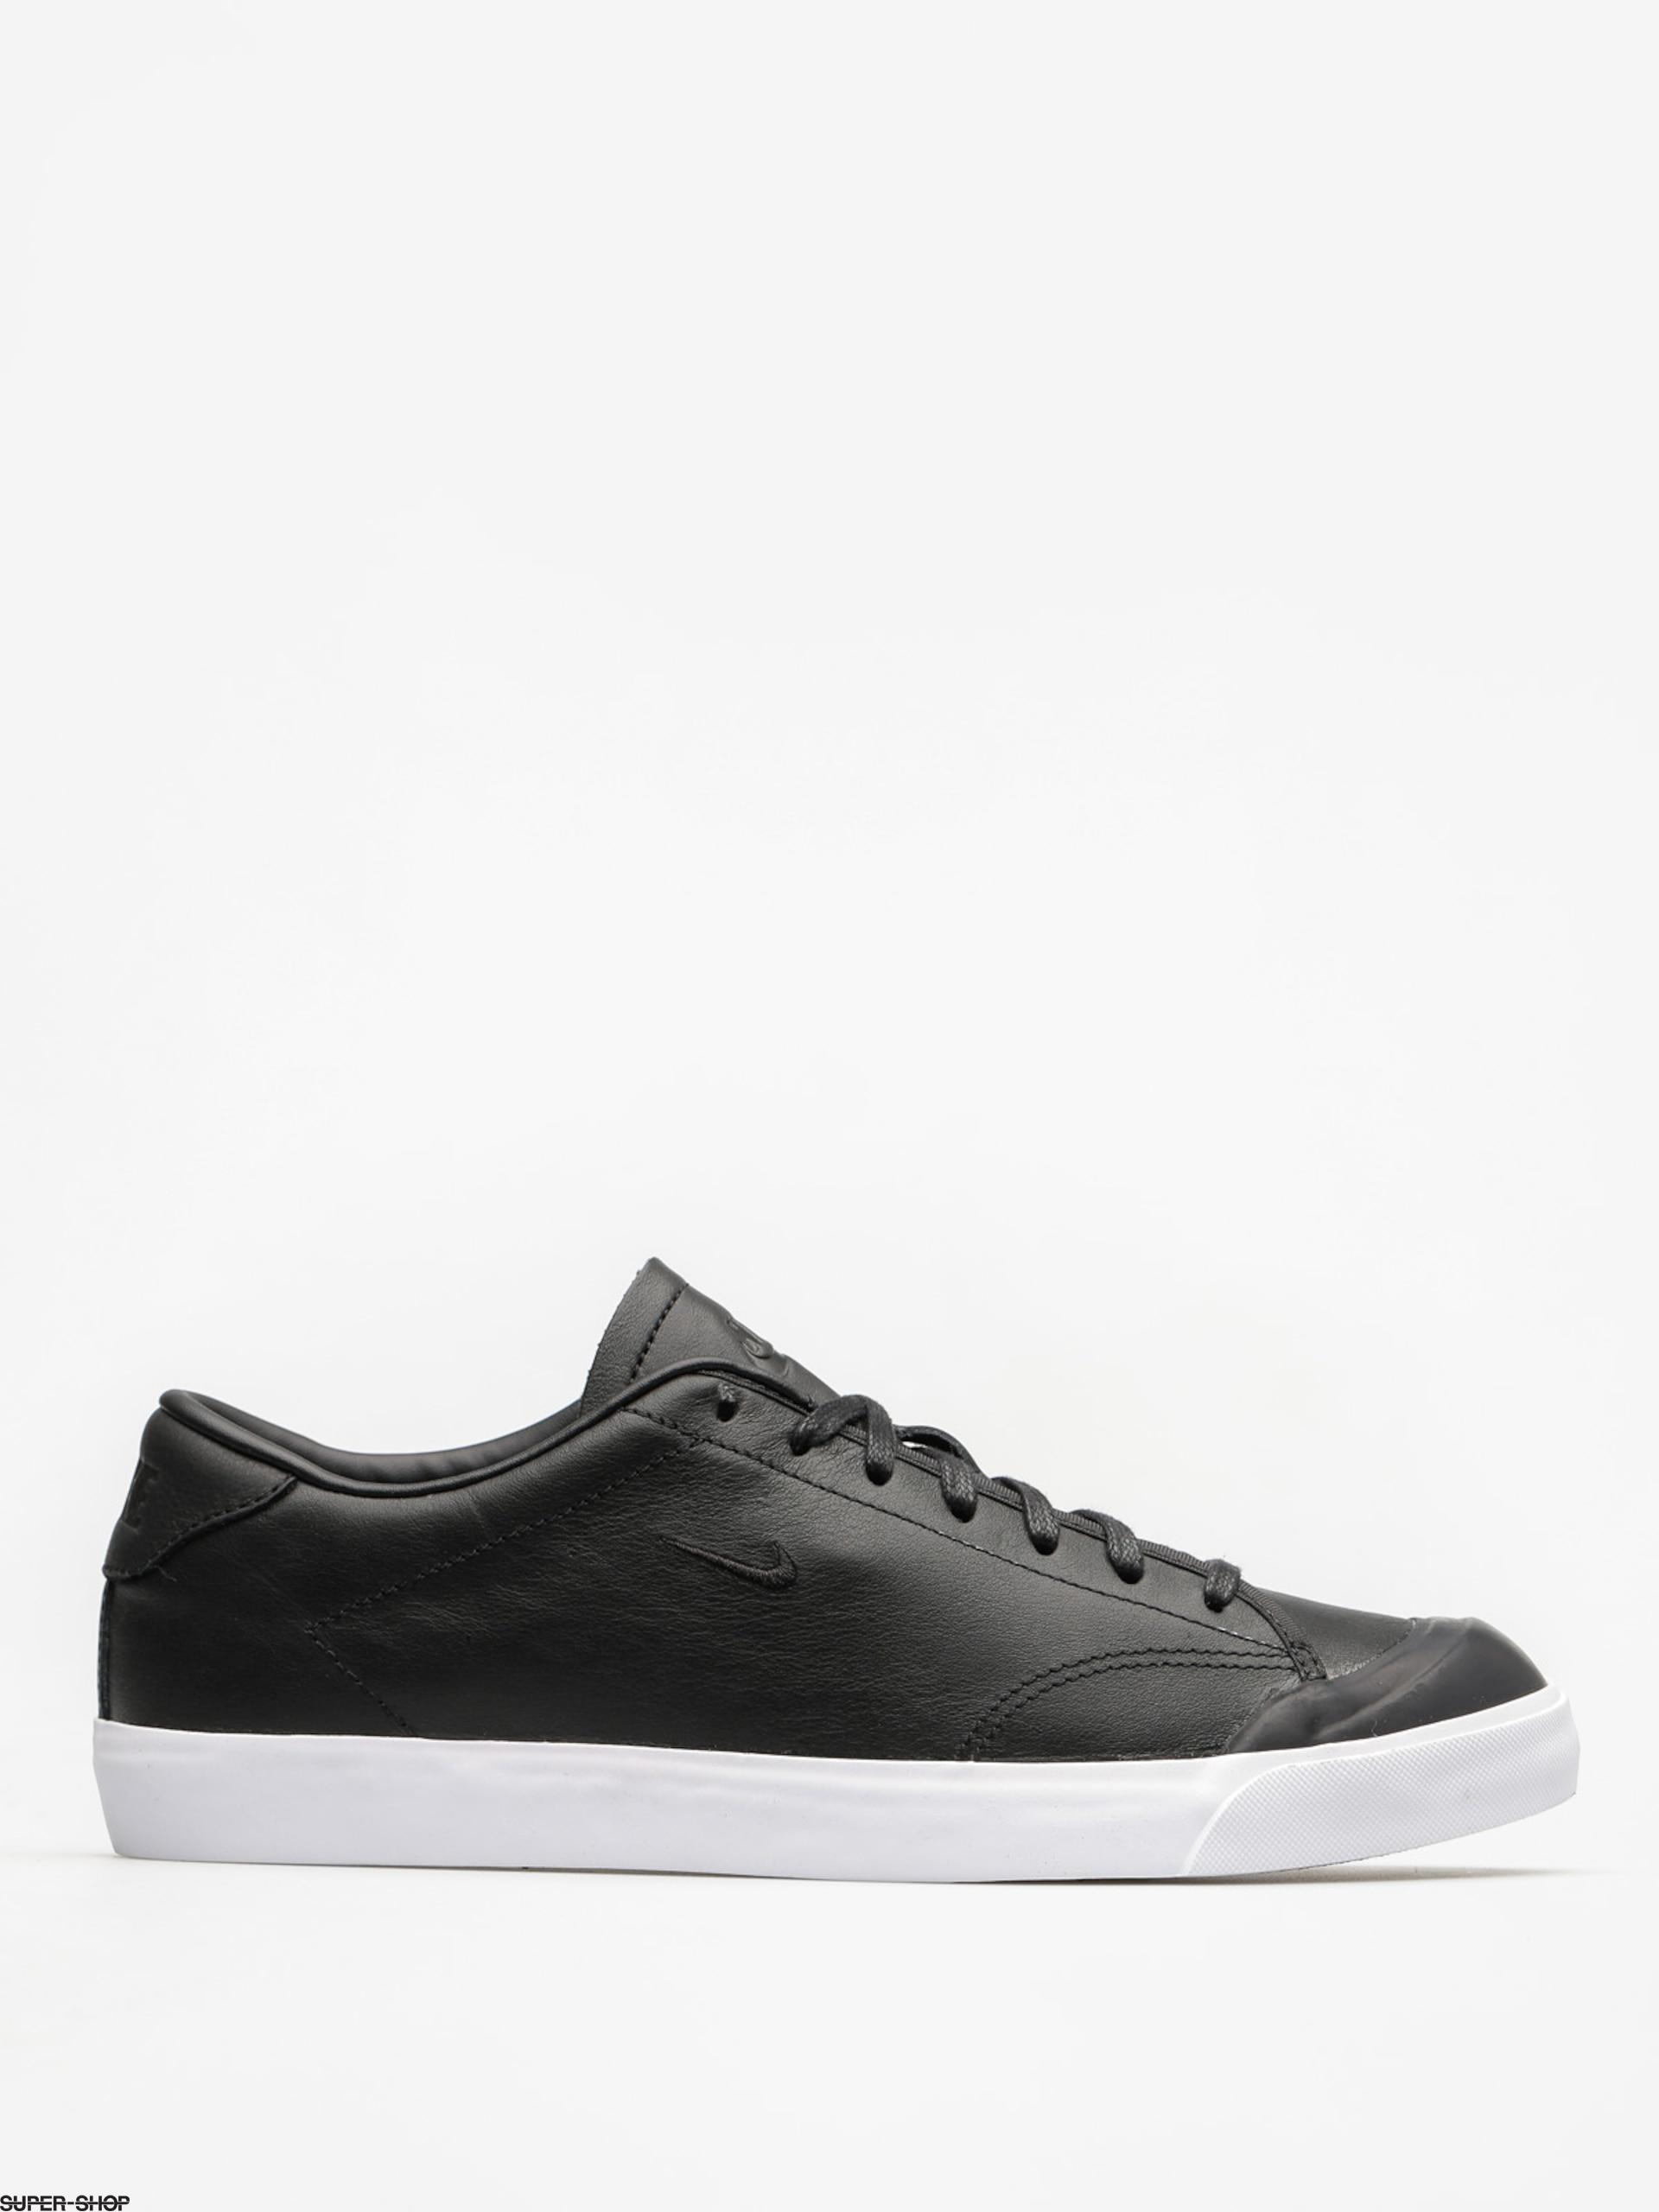 restante no relacionado Pogo stick jump  Nike All Court 2 Low Leather Shoes (black/black white)